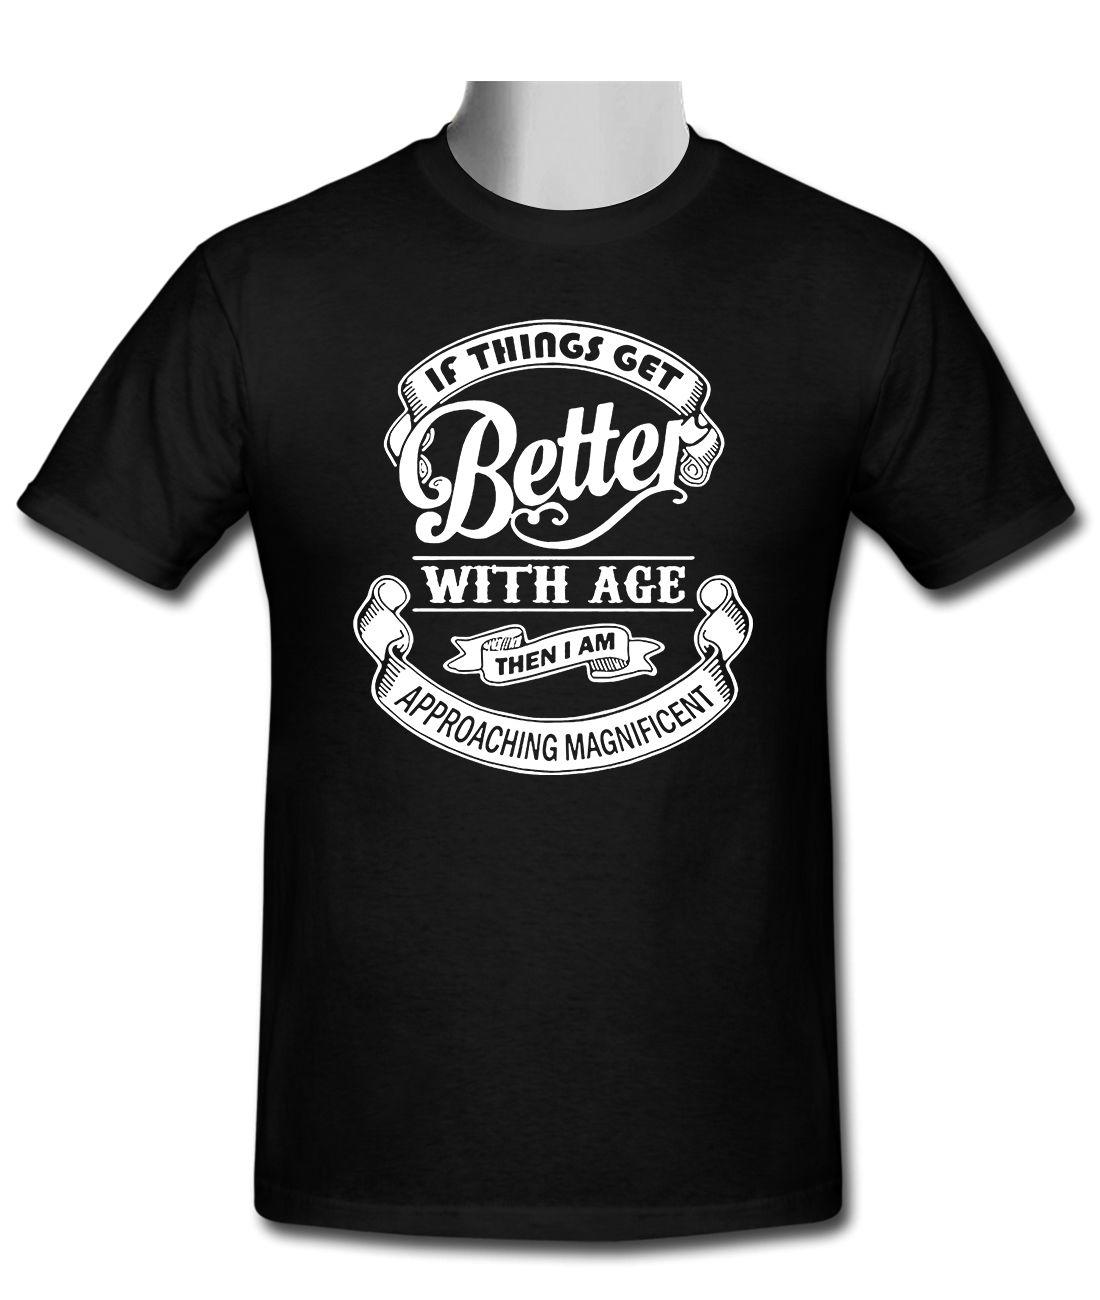 Camiseta negra para hombre If Things Get Better con tallas S-3XL, cuello redondo, mangas cortas, camisetas de algodón para hombre